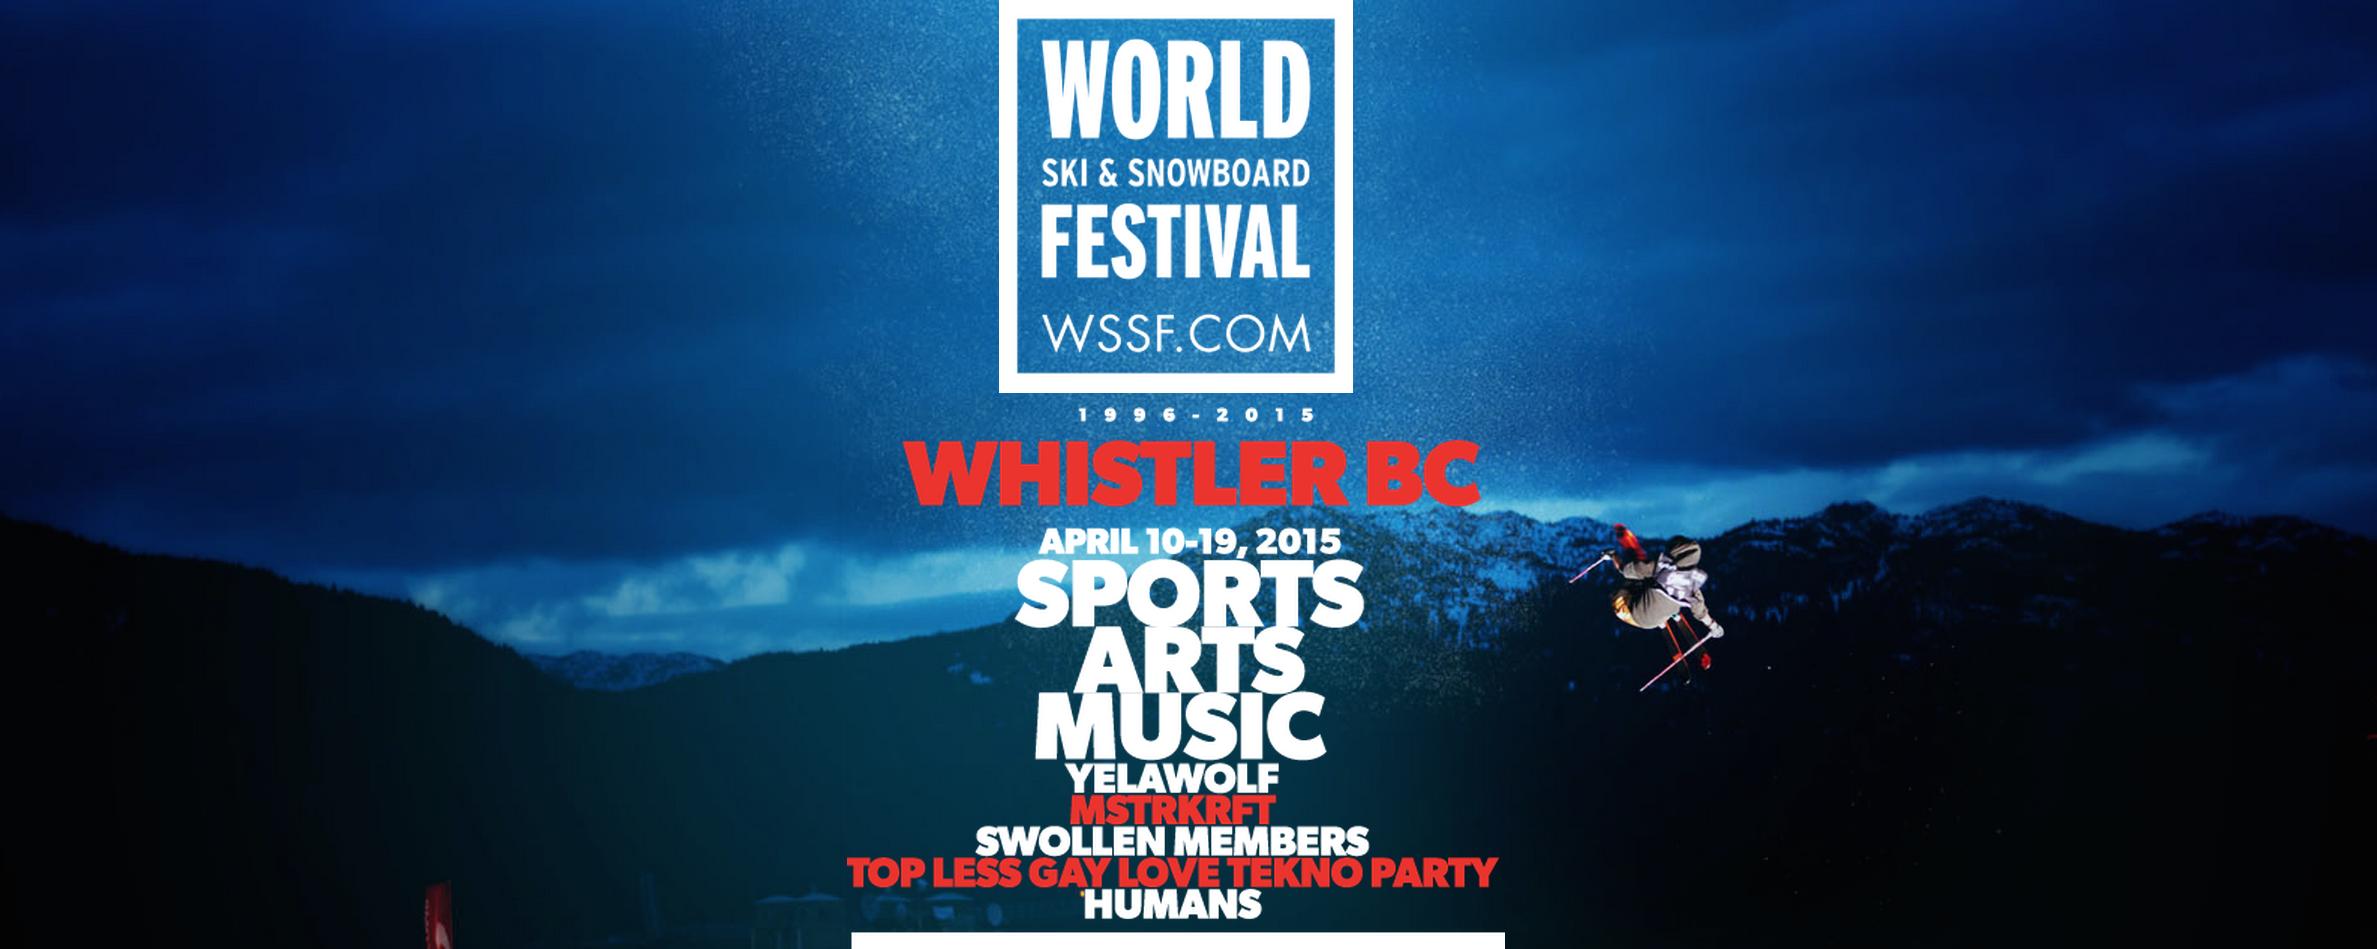 WSSF World Ski and Snowboard Festival